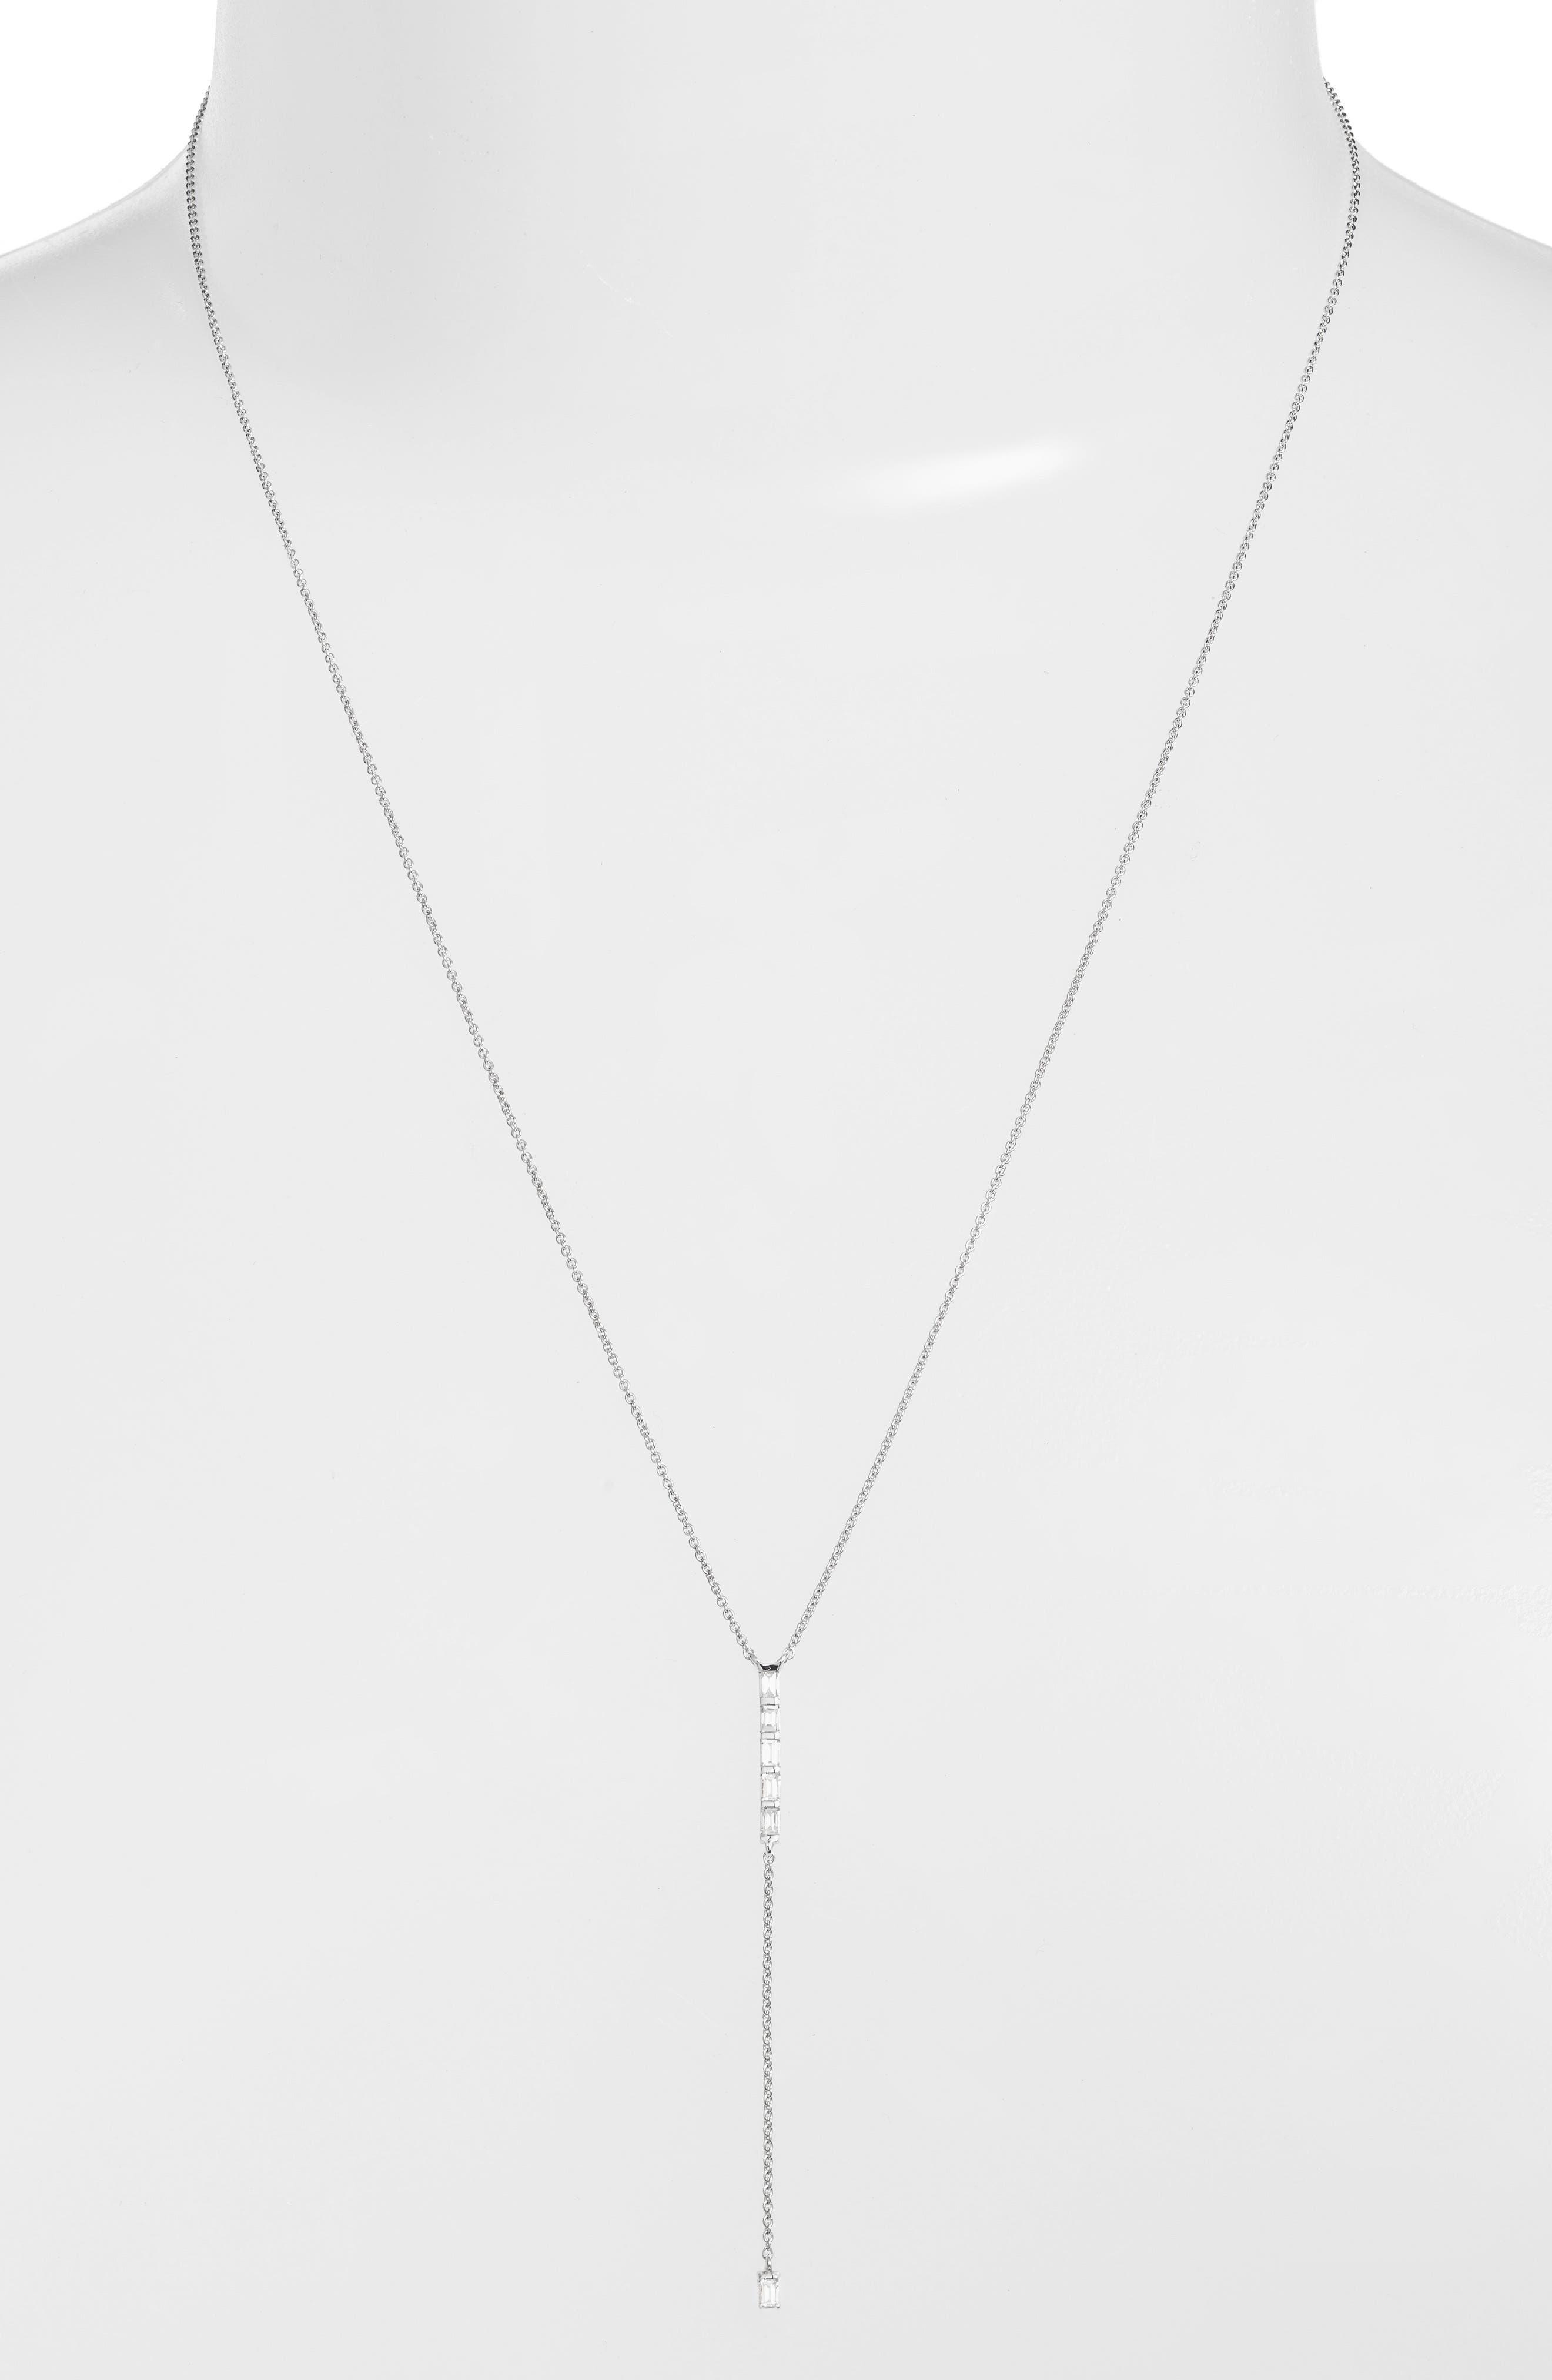 Dana Rebecca Designs Sadie Diamond Y-Necklace